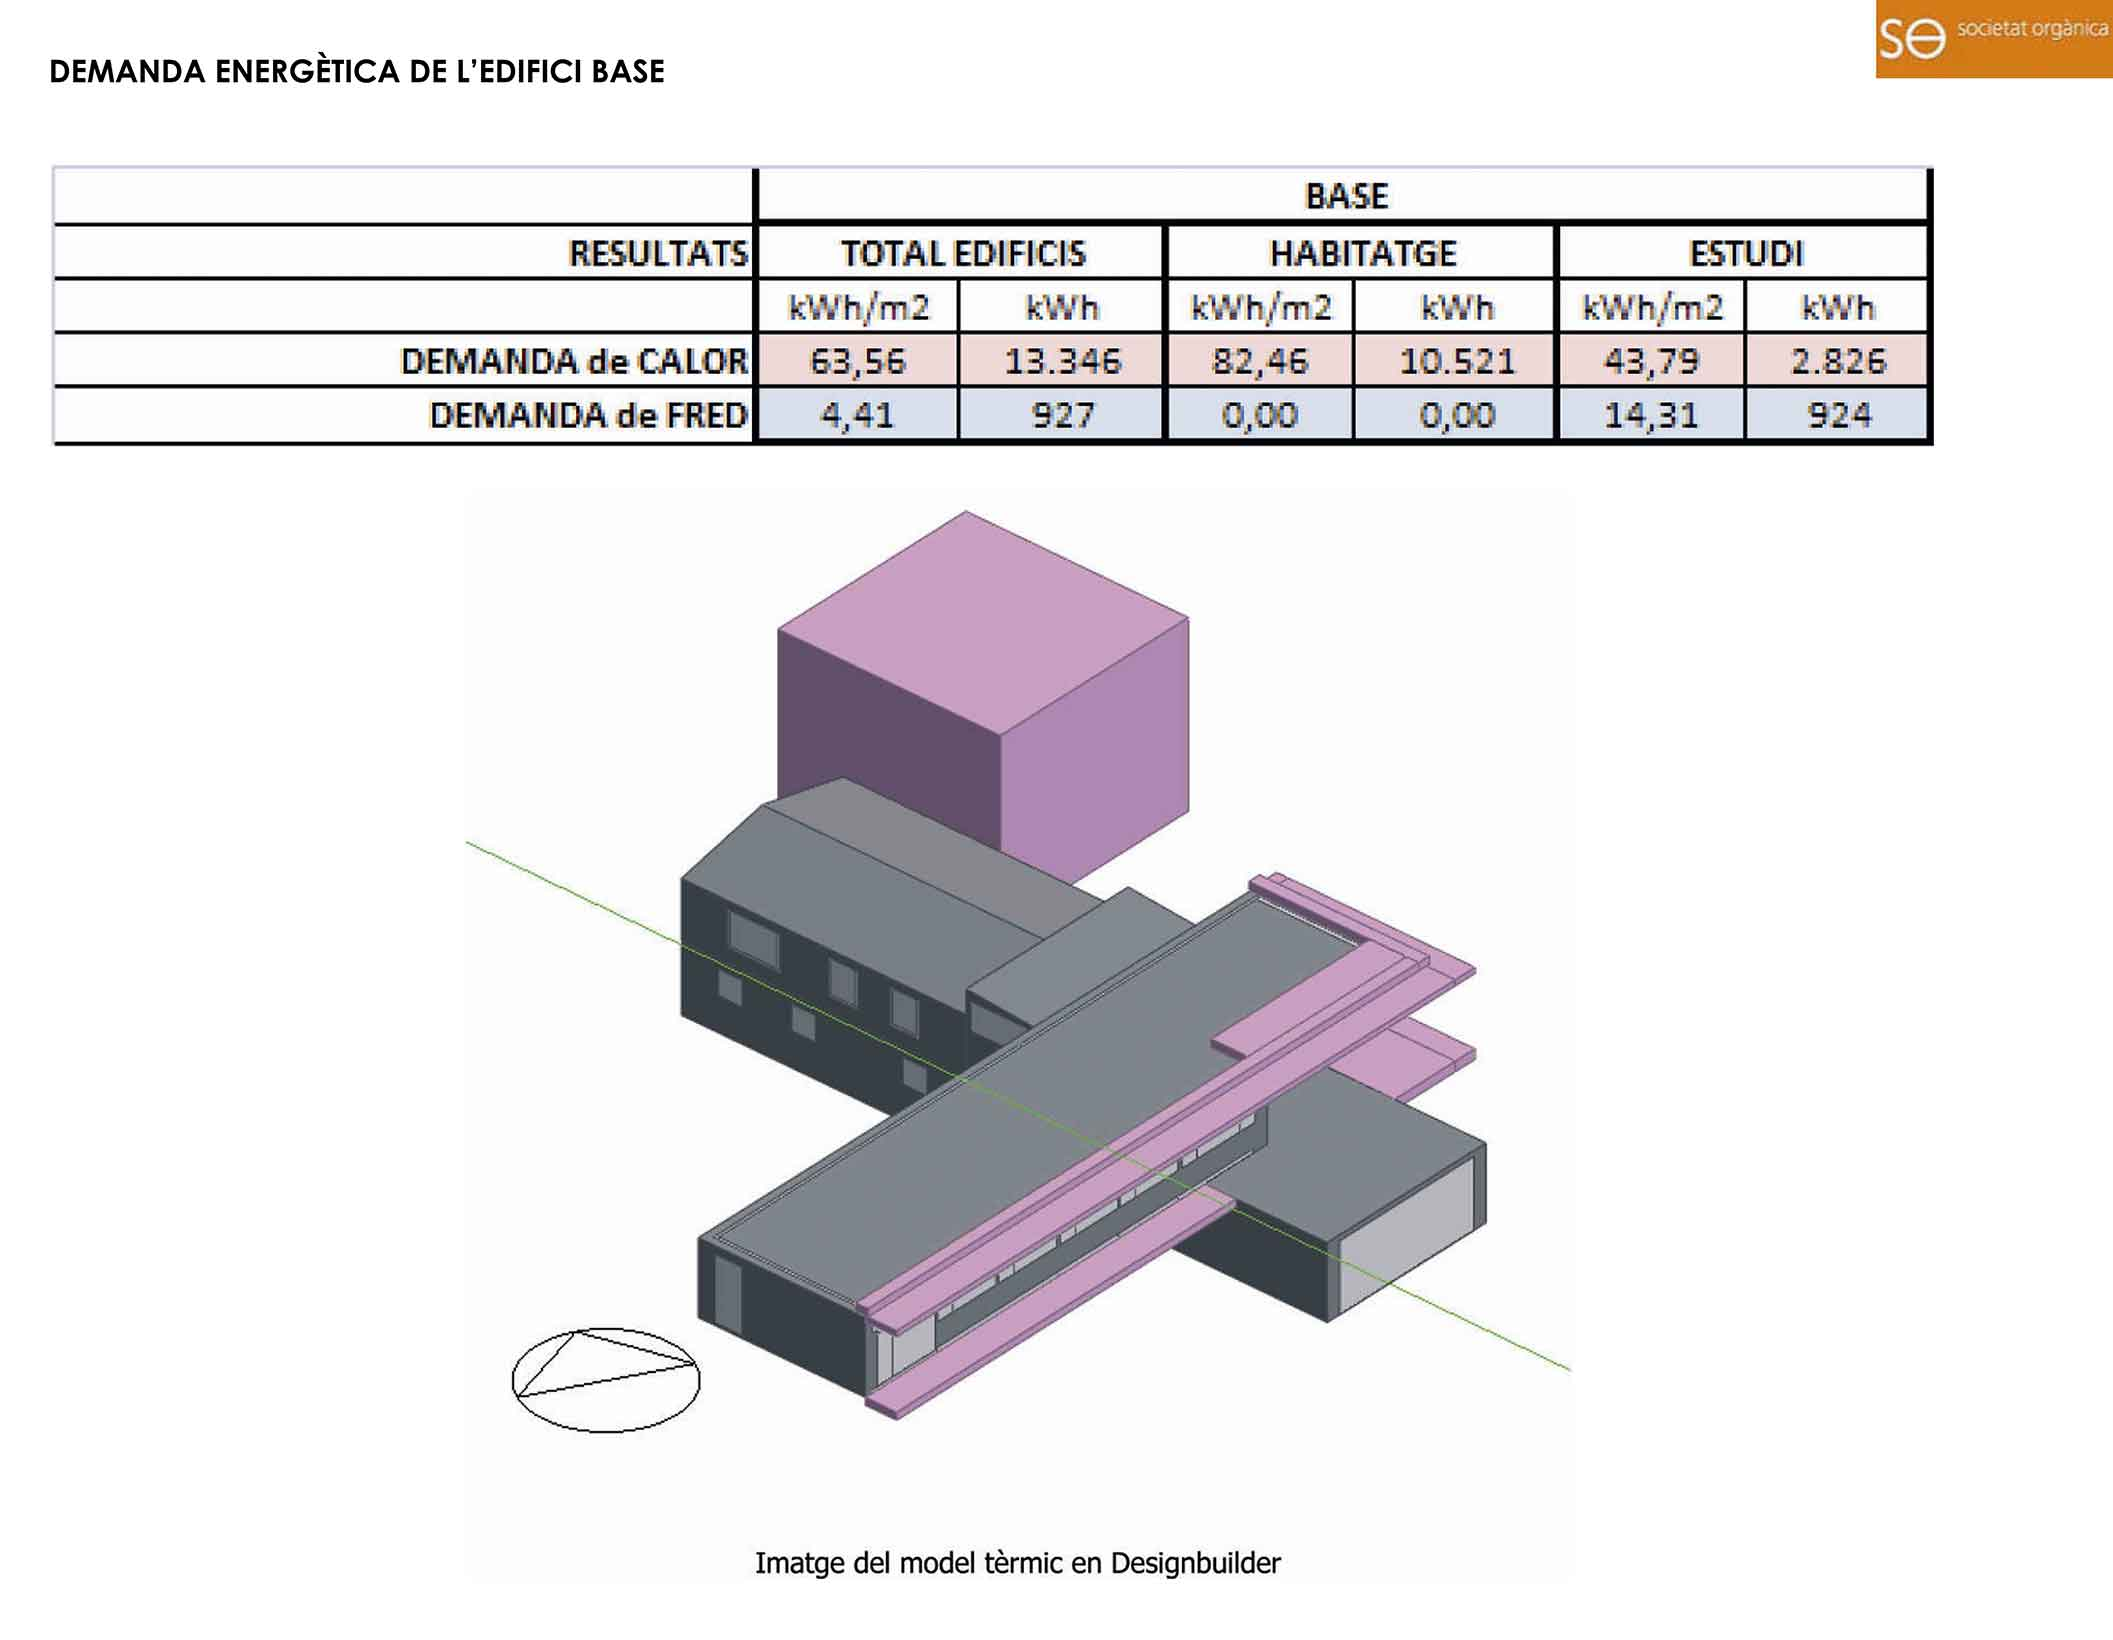 demanda-energetica-puigdemasa.jpg